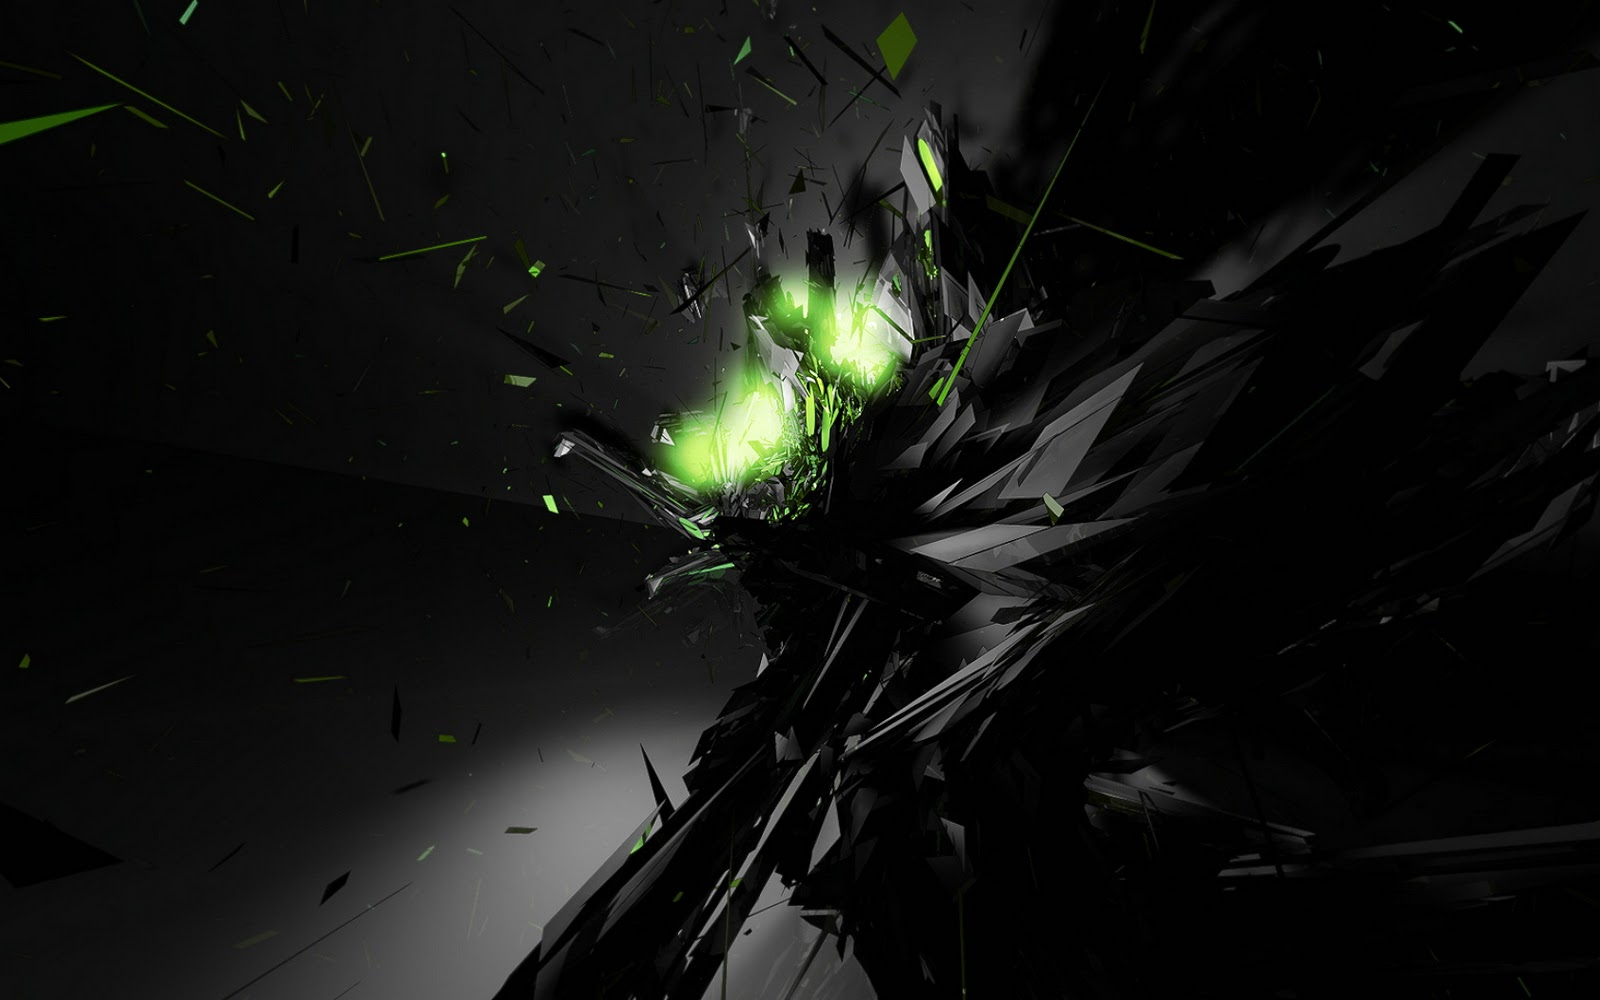 Wallpaper Hd Abstract Black